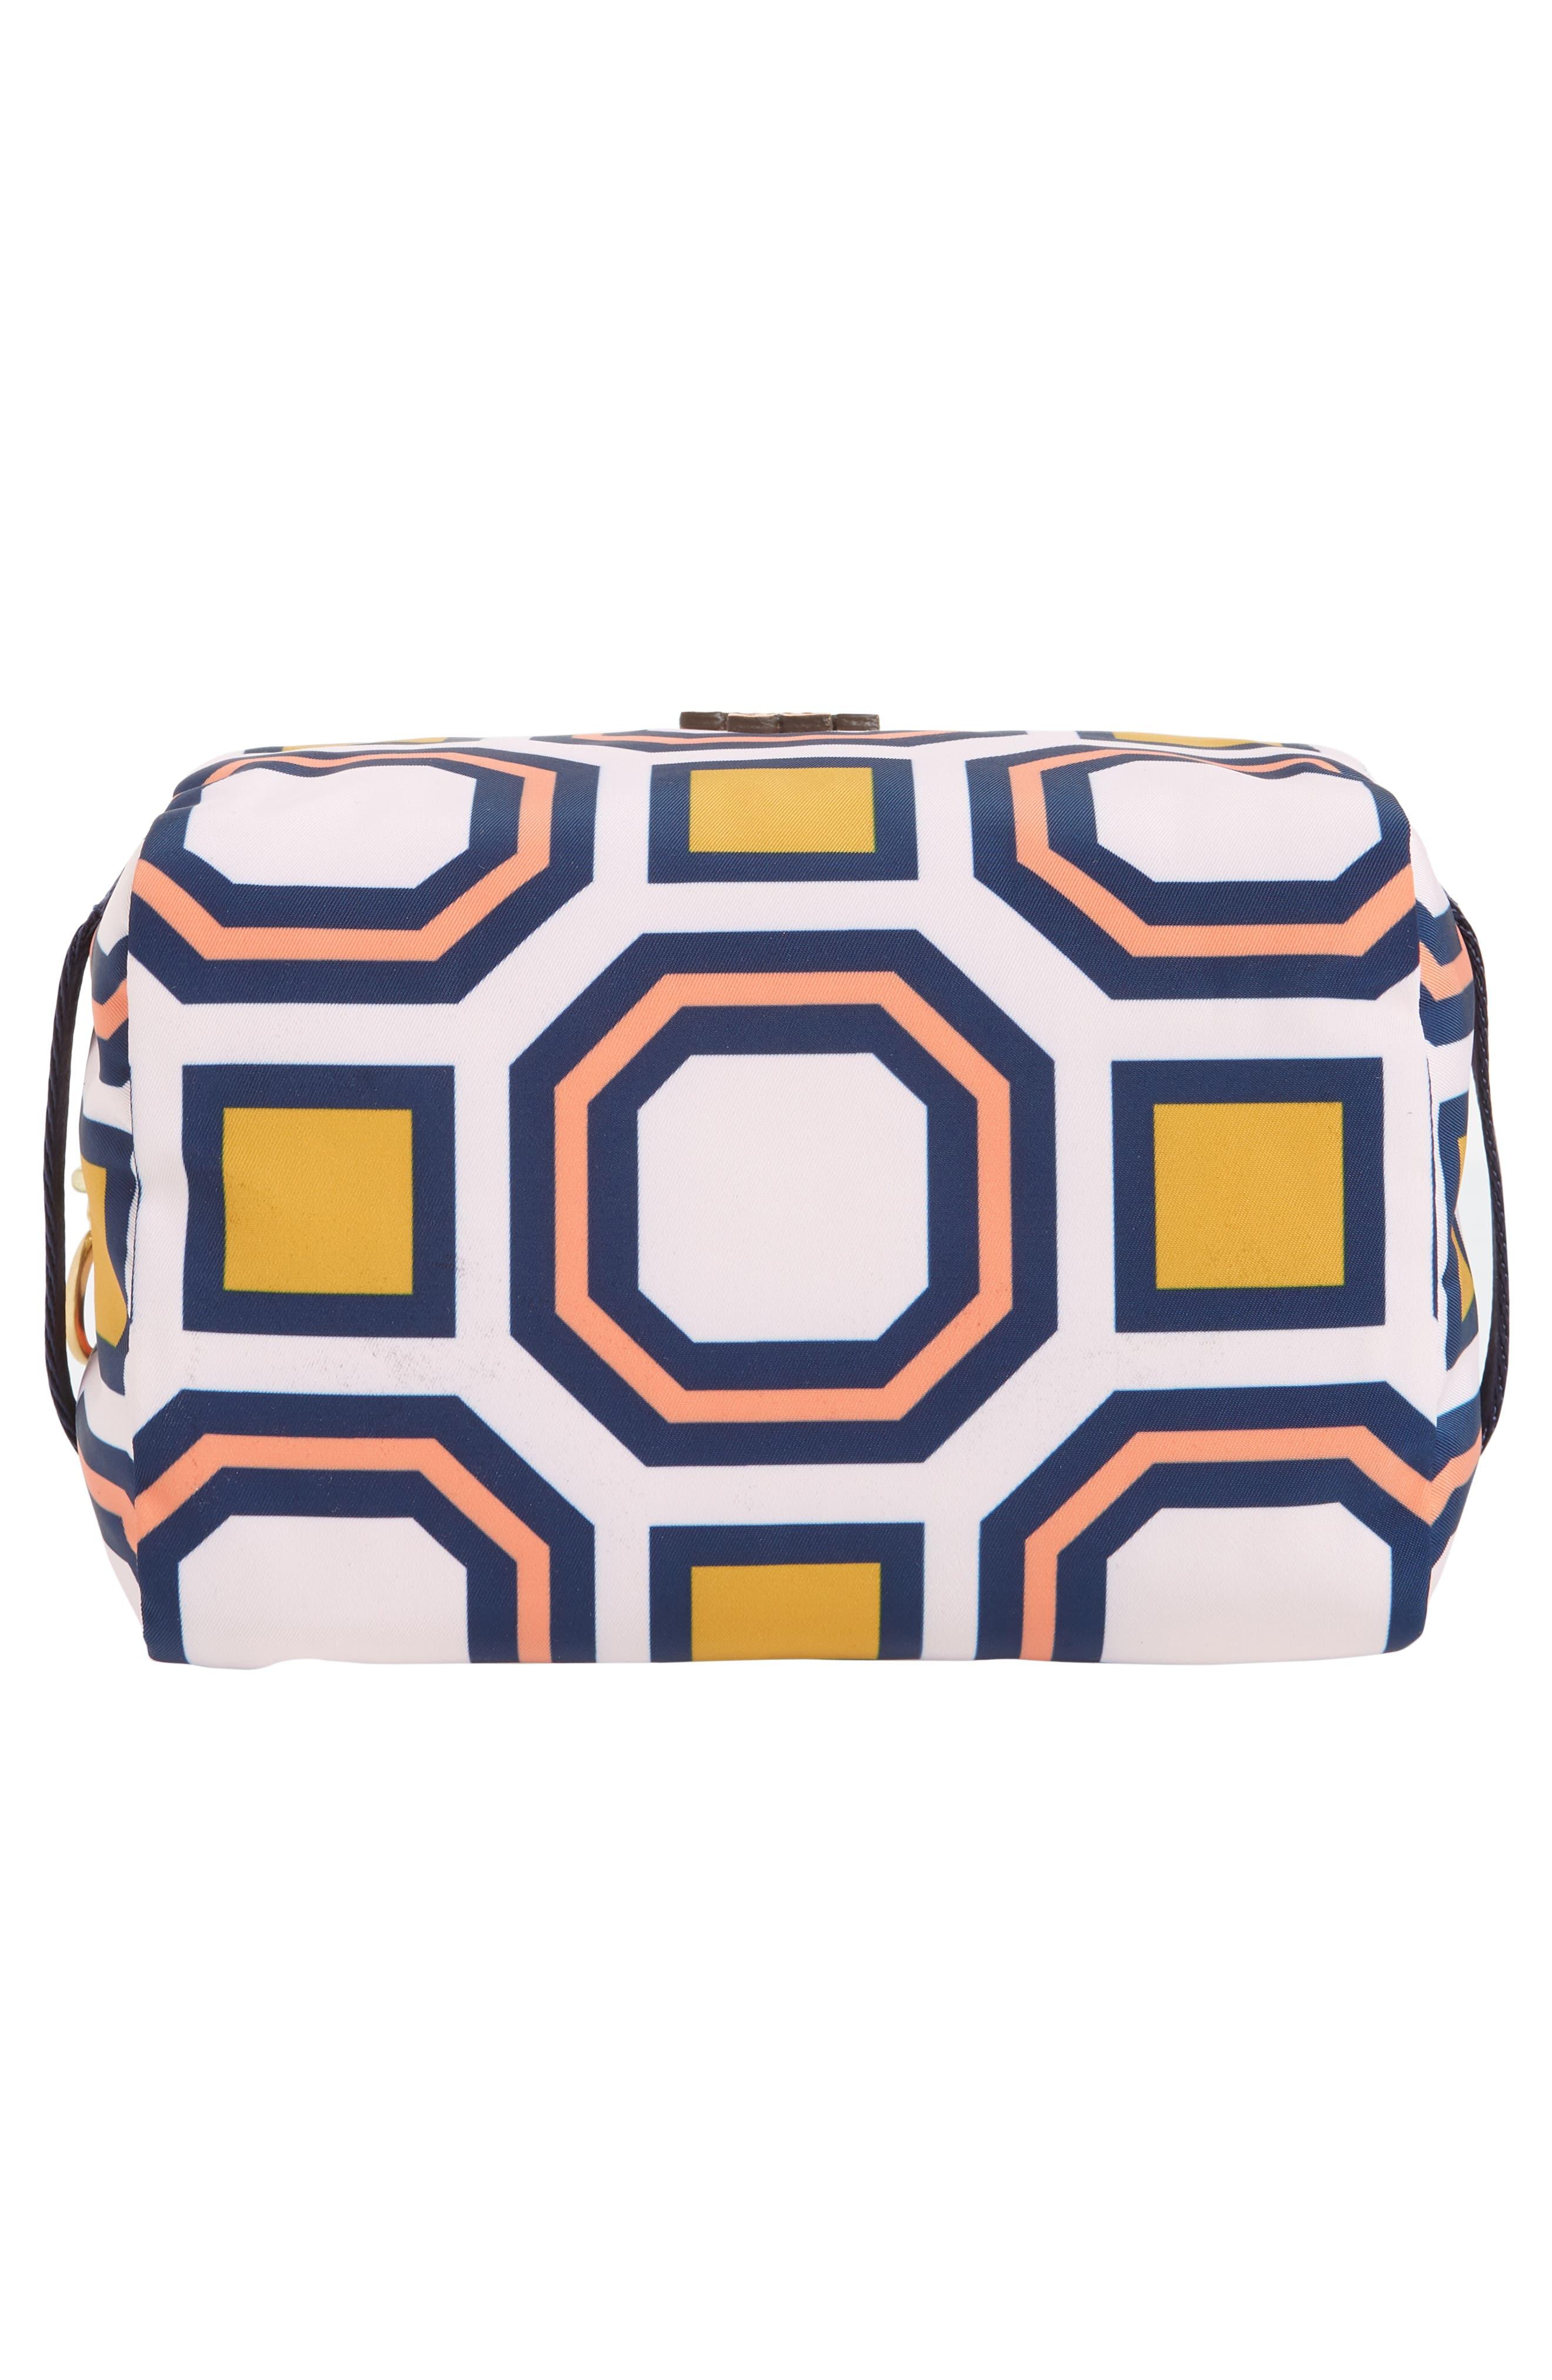 Octagon Print Medium Cosmetics Bag,                             Alternate thumbnail 5, color,